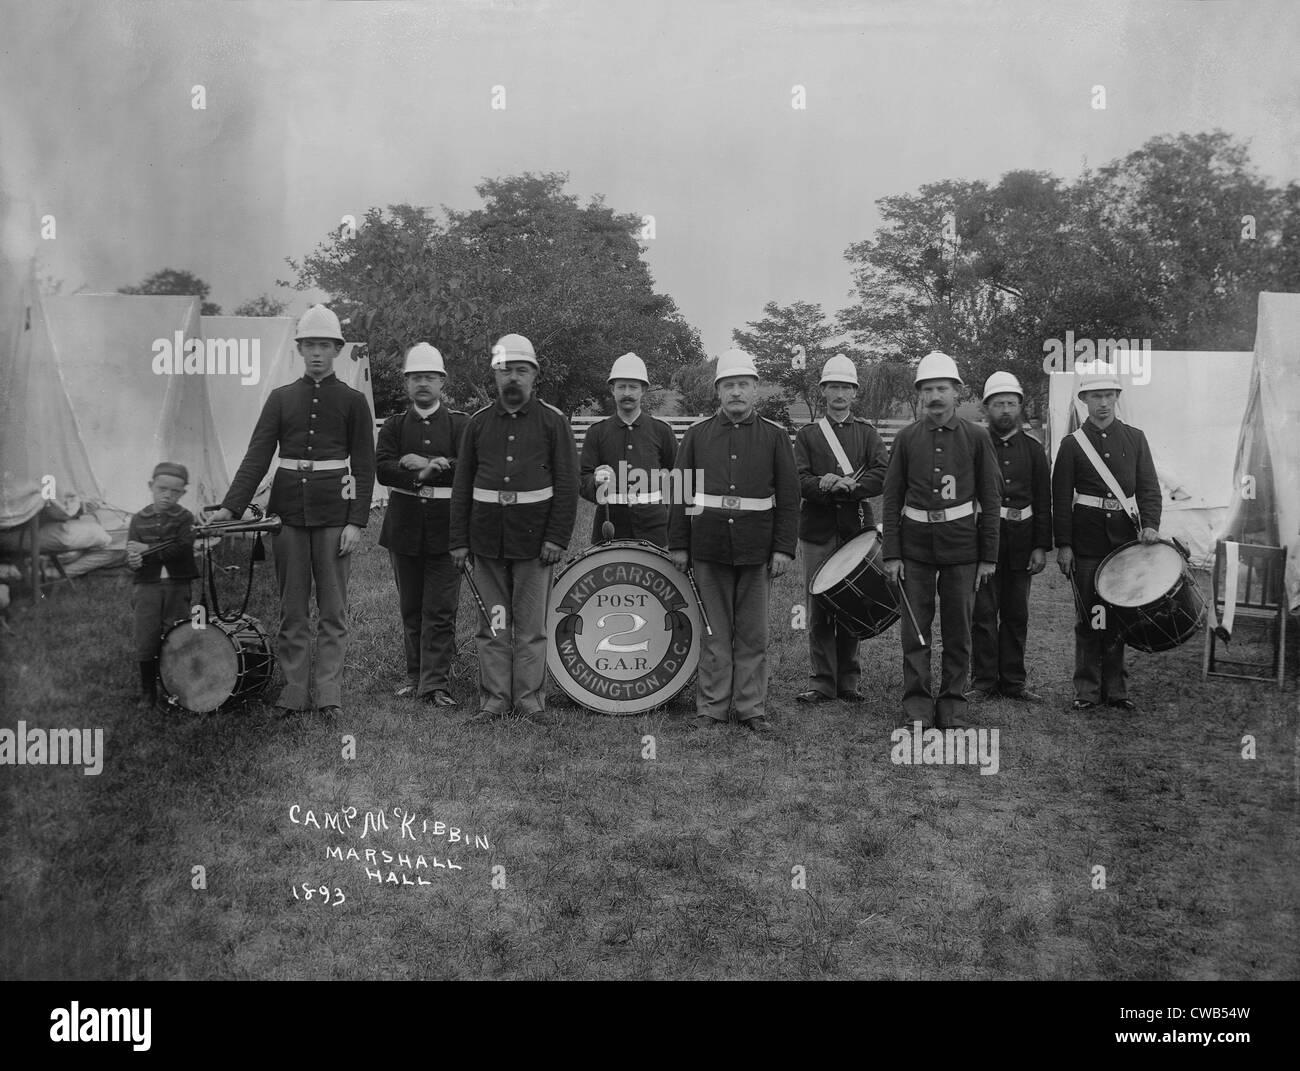 Kit Carson's band, Camp McKibbin, photograph, 1893. - Stock Image